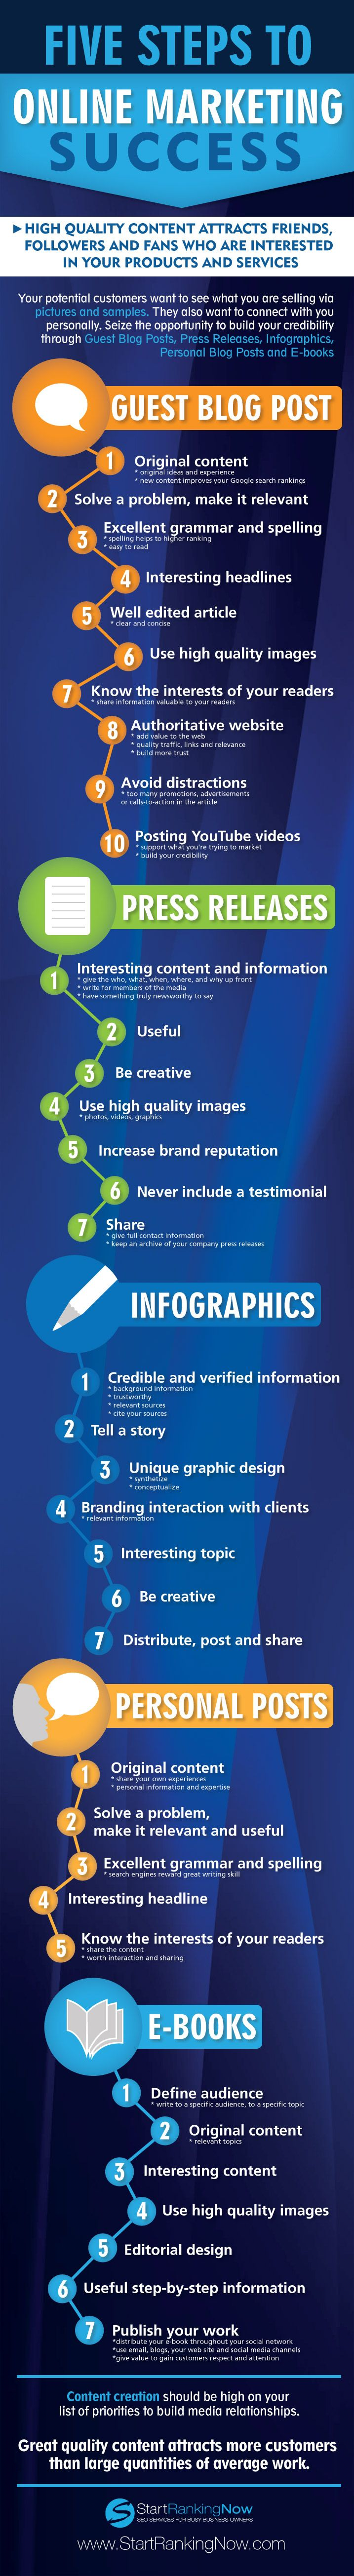 5 steps to online marketing success [infographic]. Visit CRM Digital Marketing @ http://crmdigitalmarketing.com to receive a free online marketing consult.